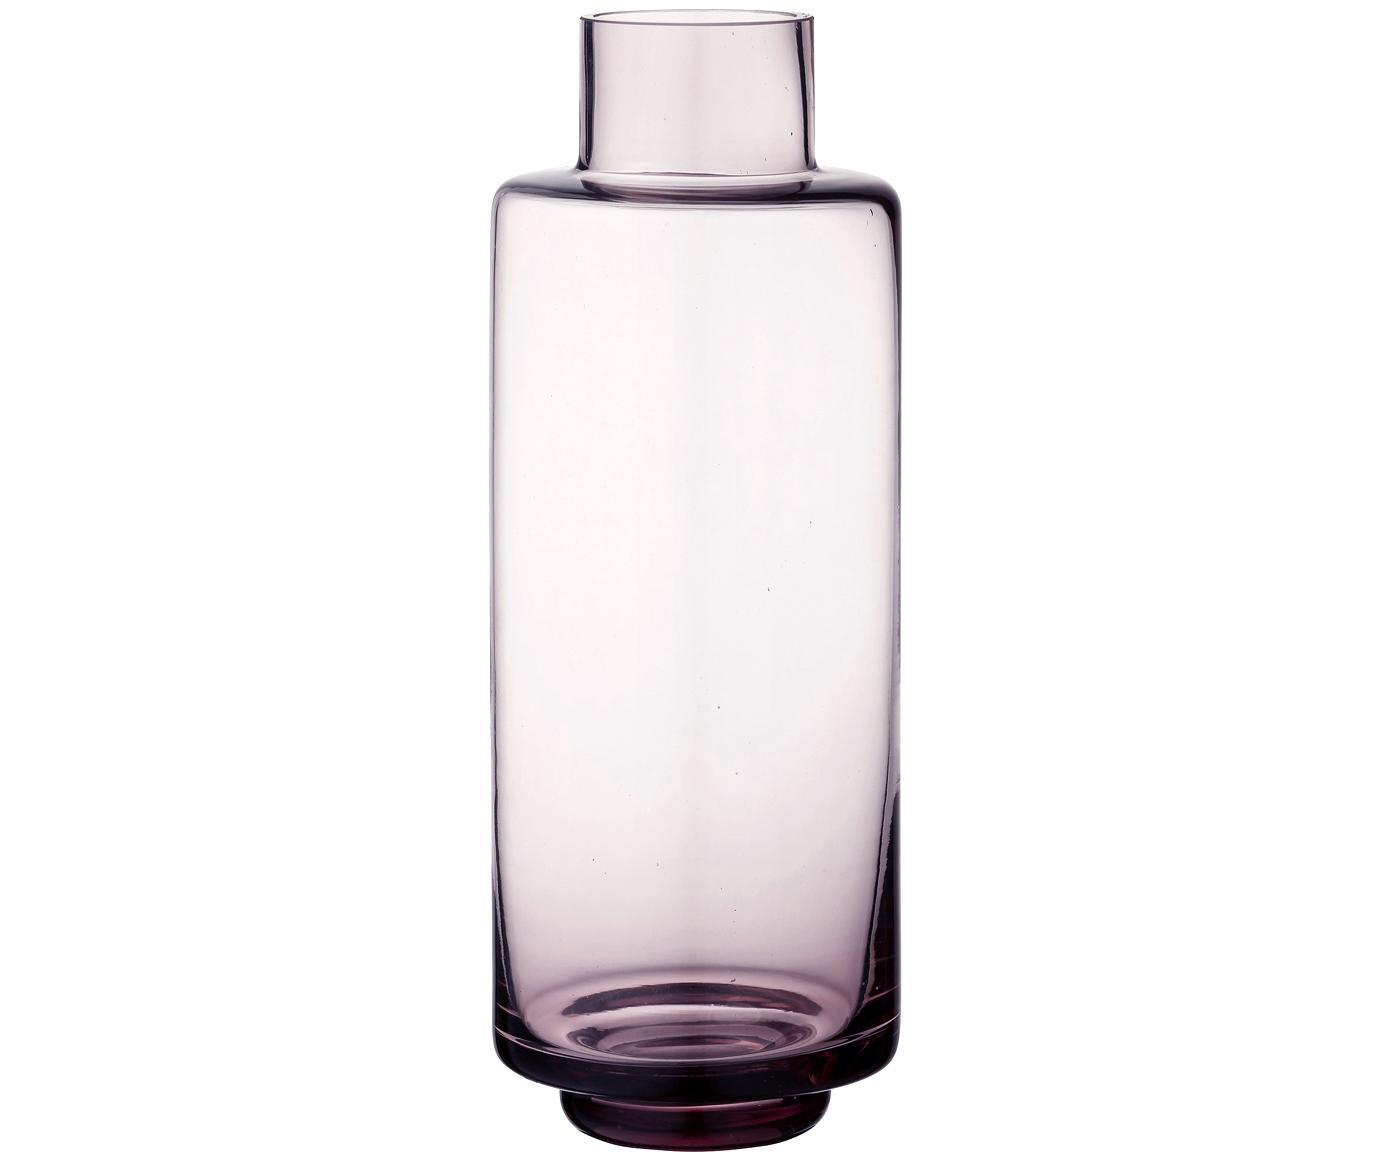 Grosse mundgeblasene Vase Hedria, Glas, Rosa, Ø 11 x H 30 cm